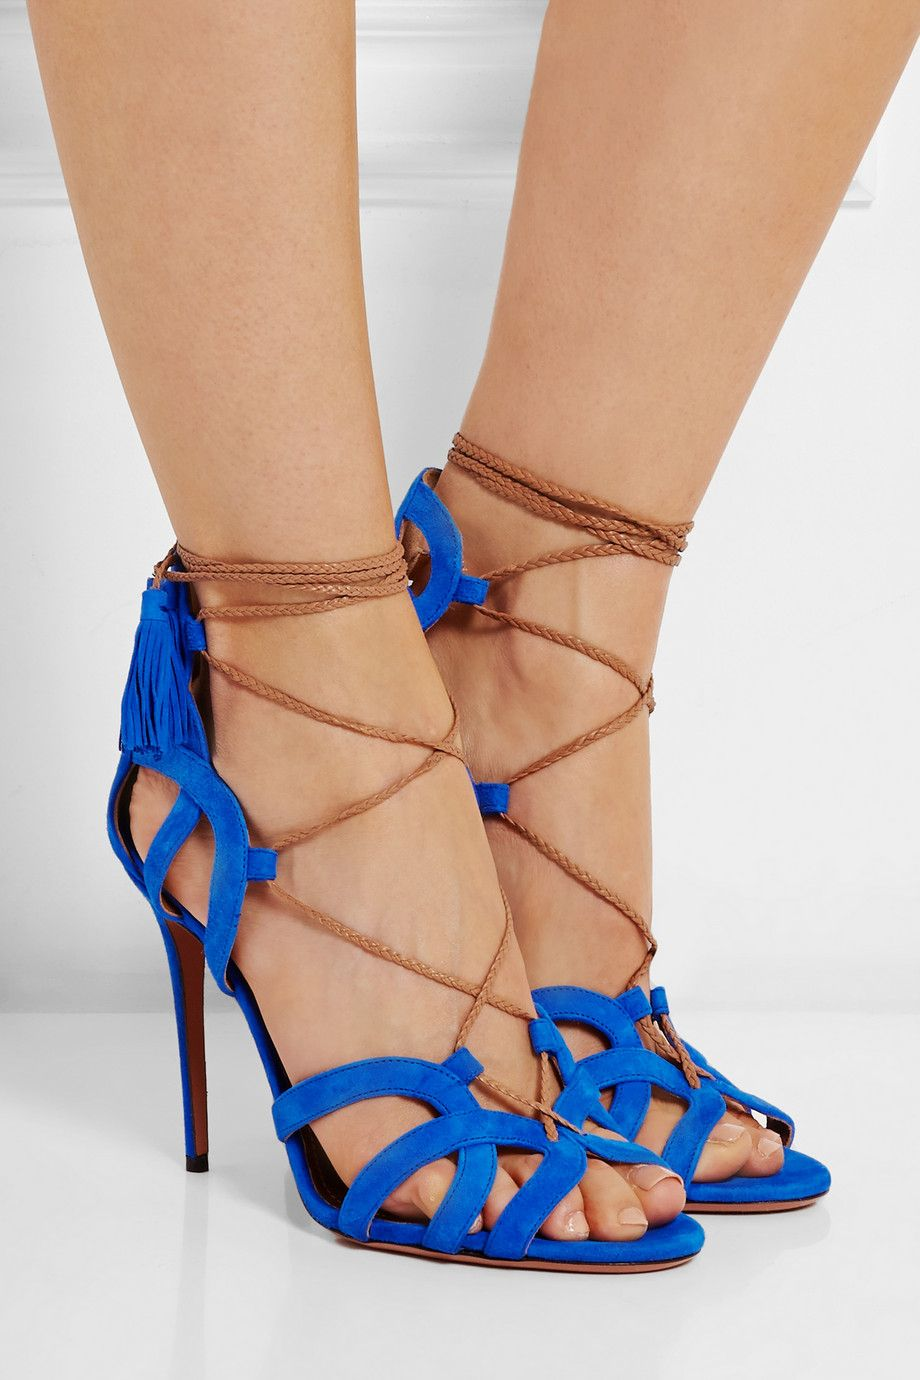 Aquazzura Mirage Suede Sandals supply online high quality for sale u0f5K10U5